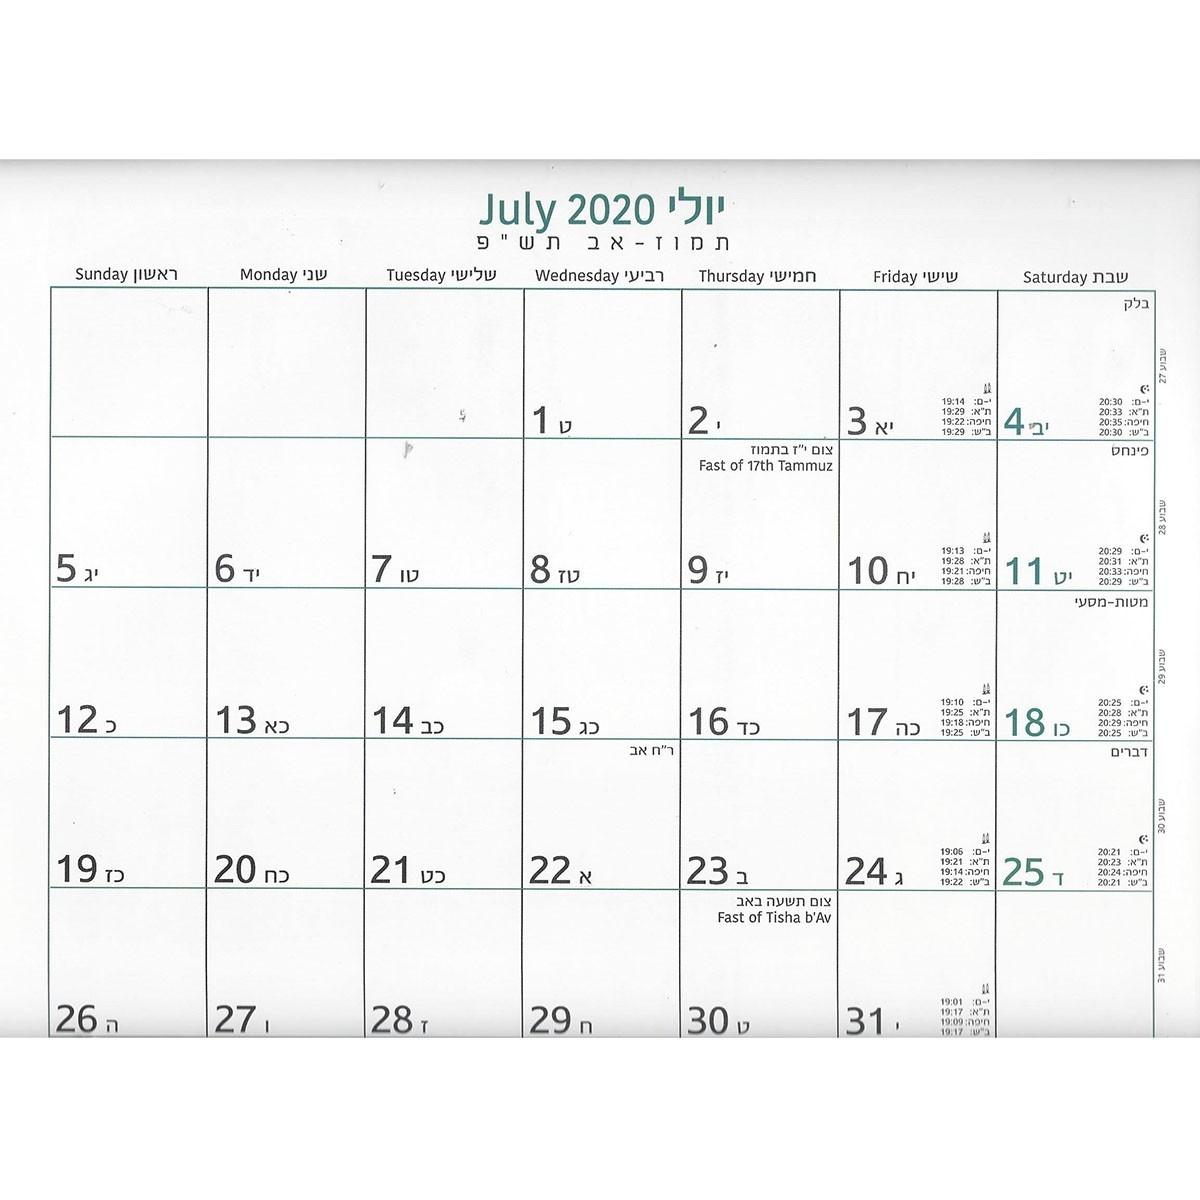 Deluxe Views Of Israel Hebrew/ English Calendar 2019-2020-Jewish Calendar January 2020